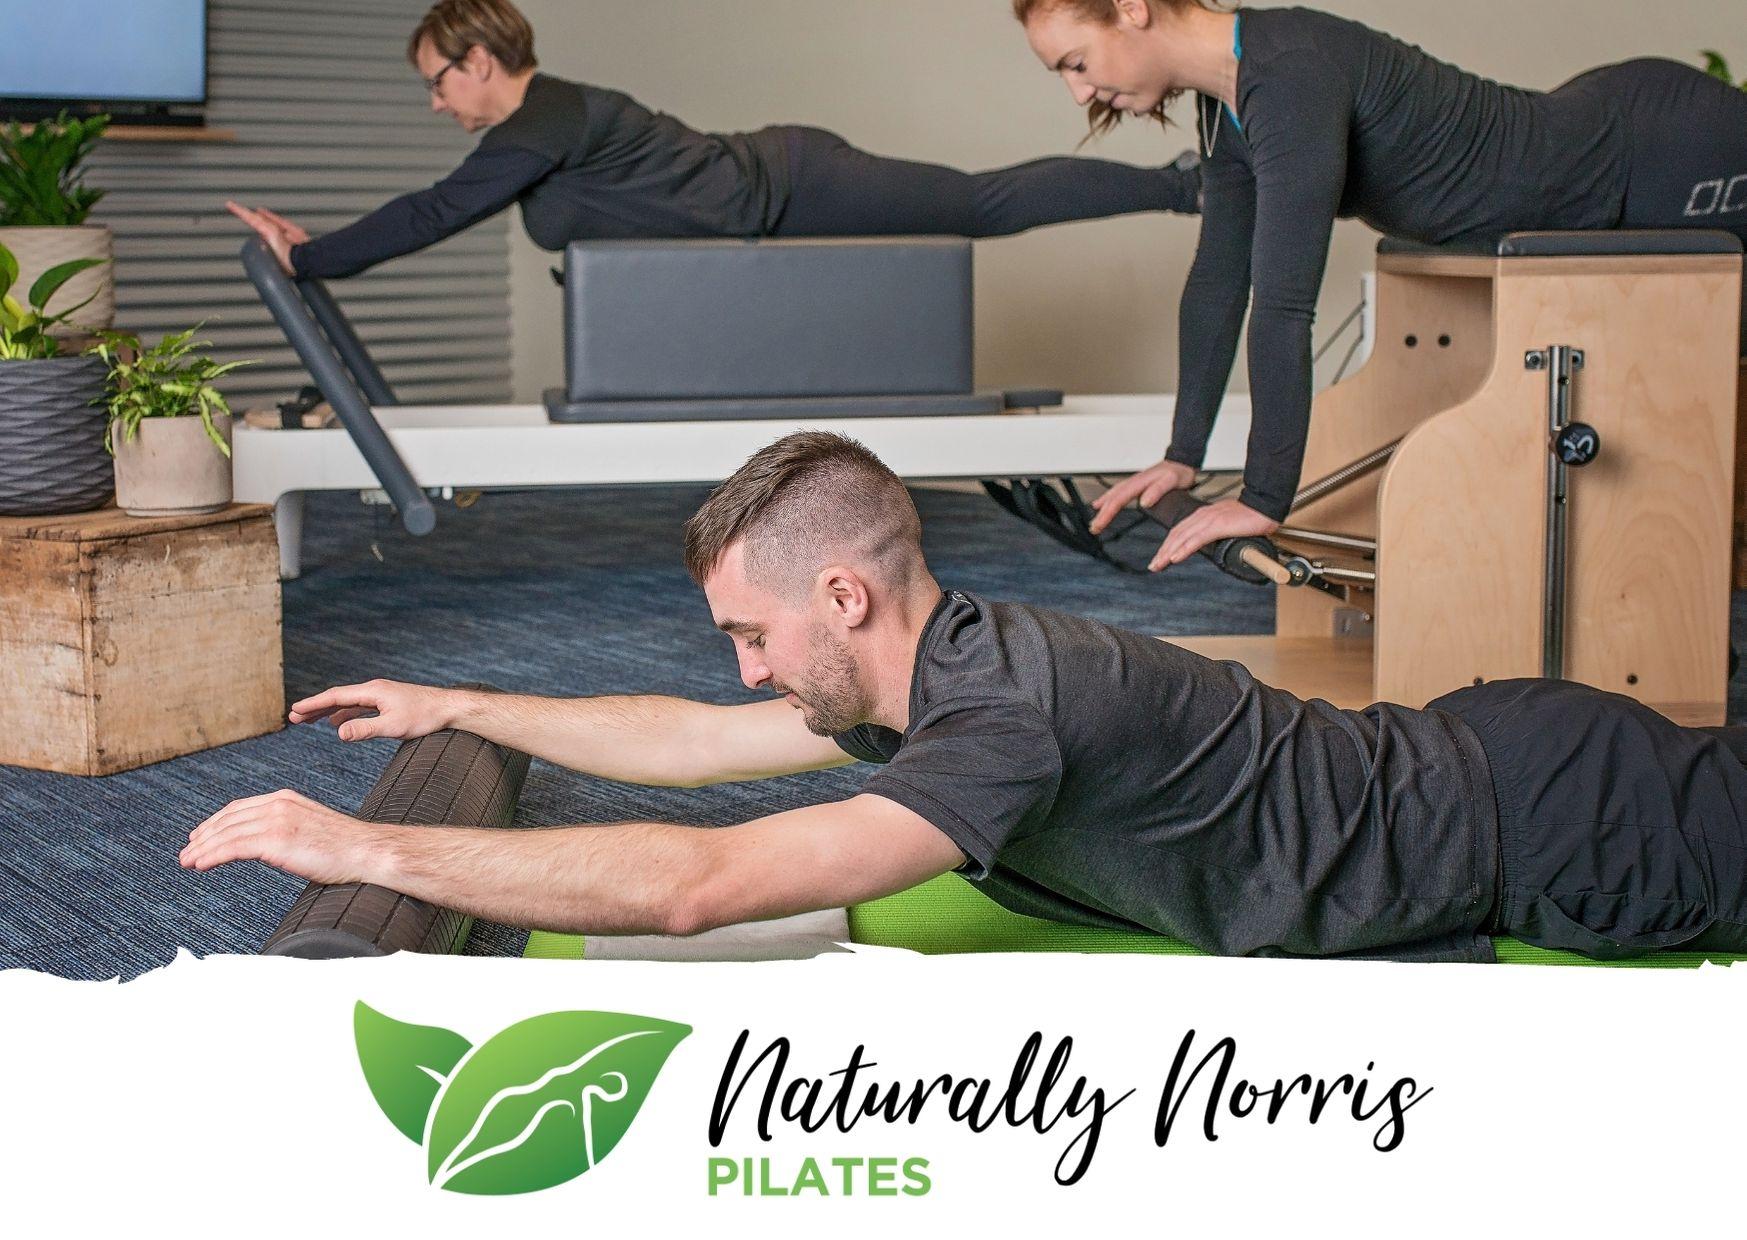 Naturally Norris Pilates